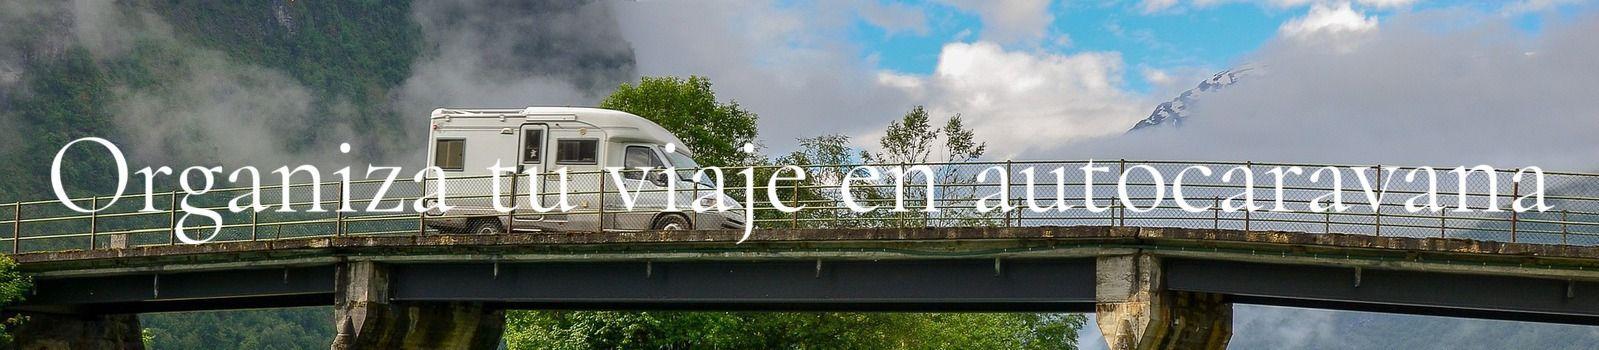 Autocaravana banner